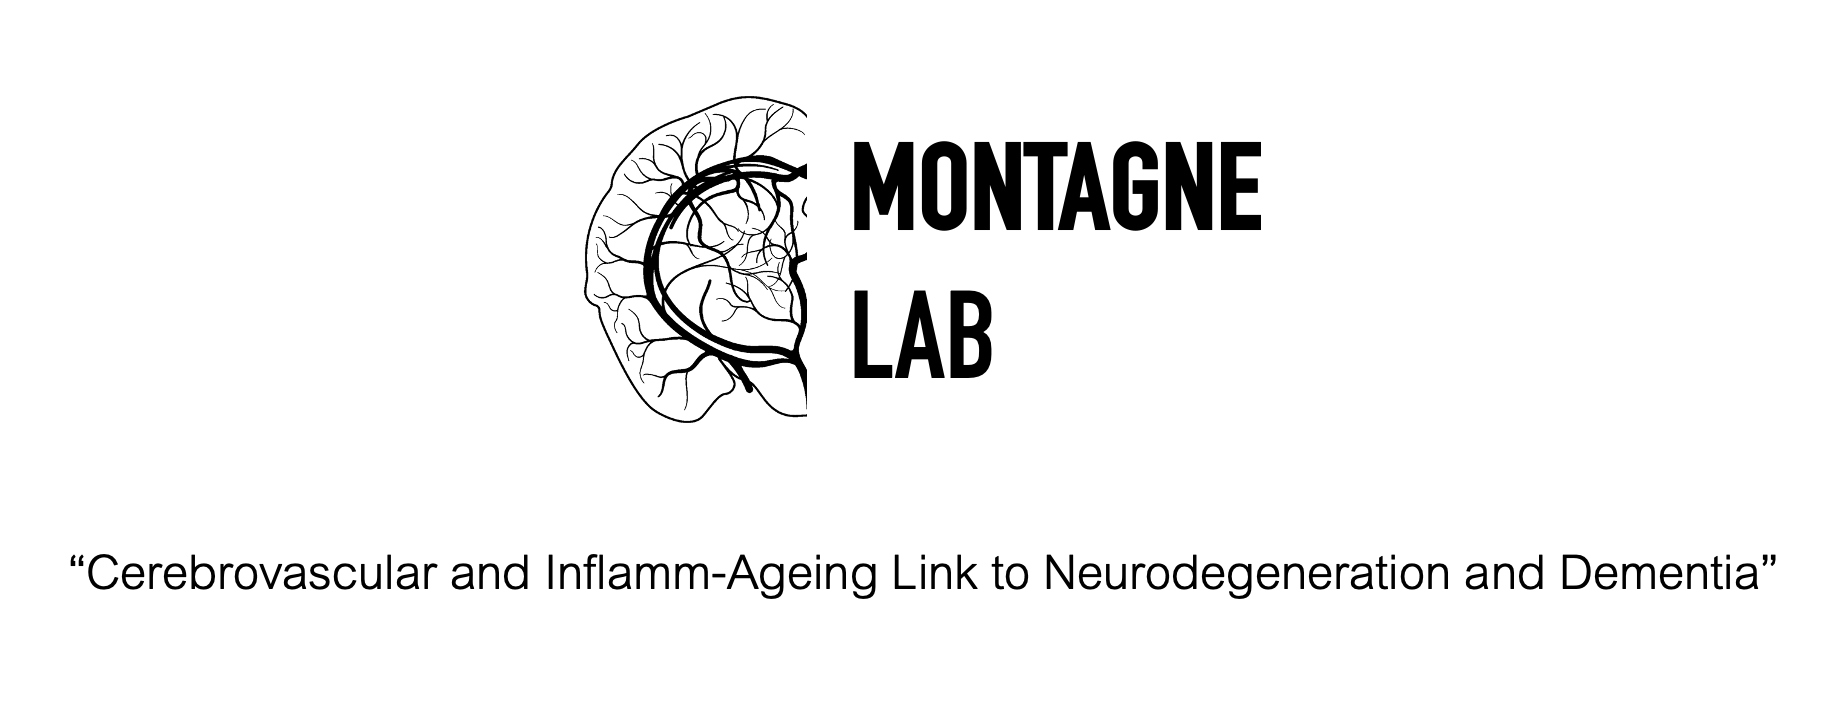 Montagne Lab